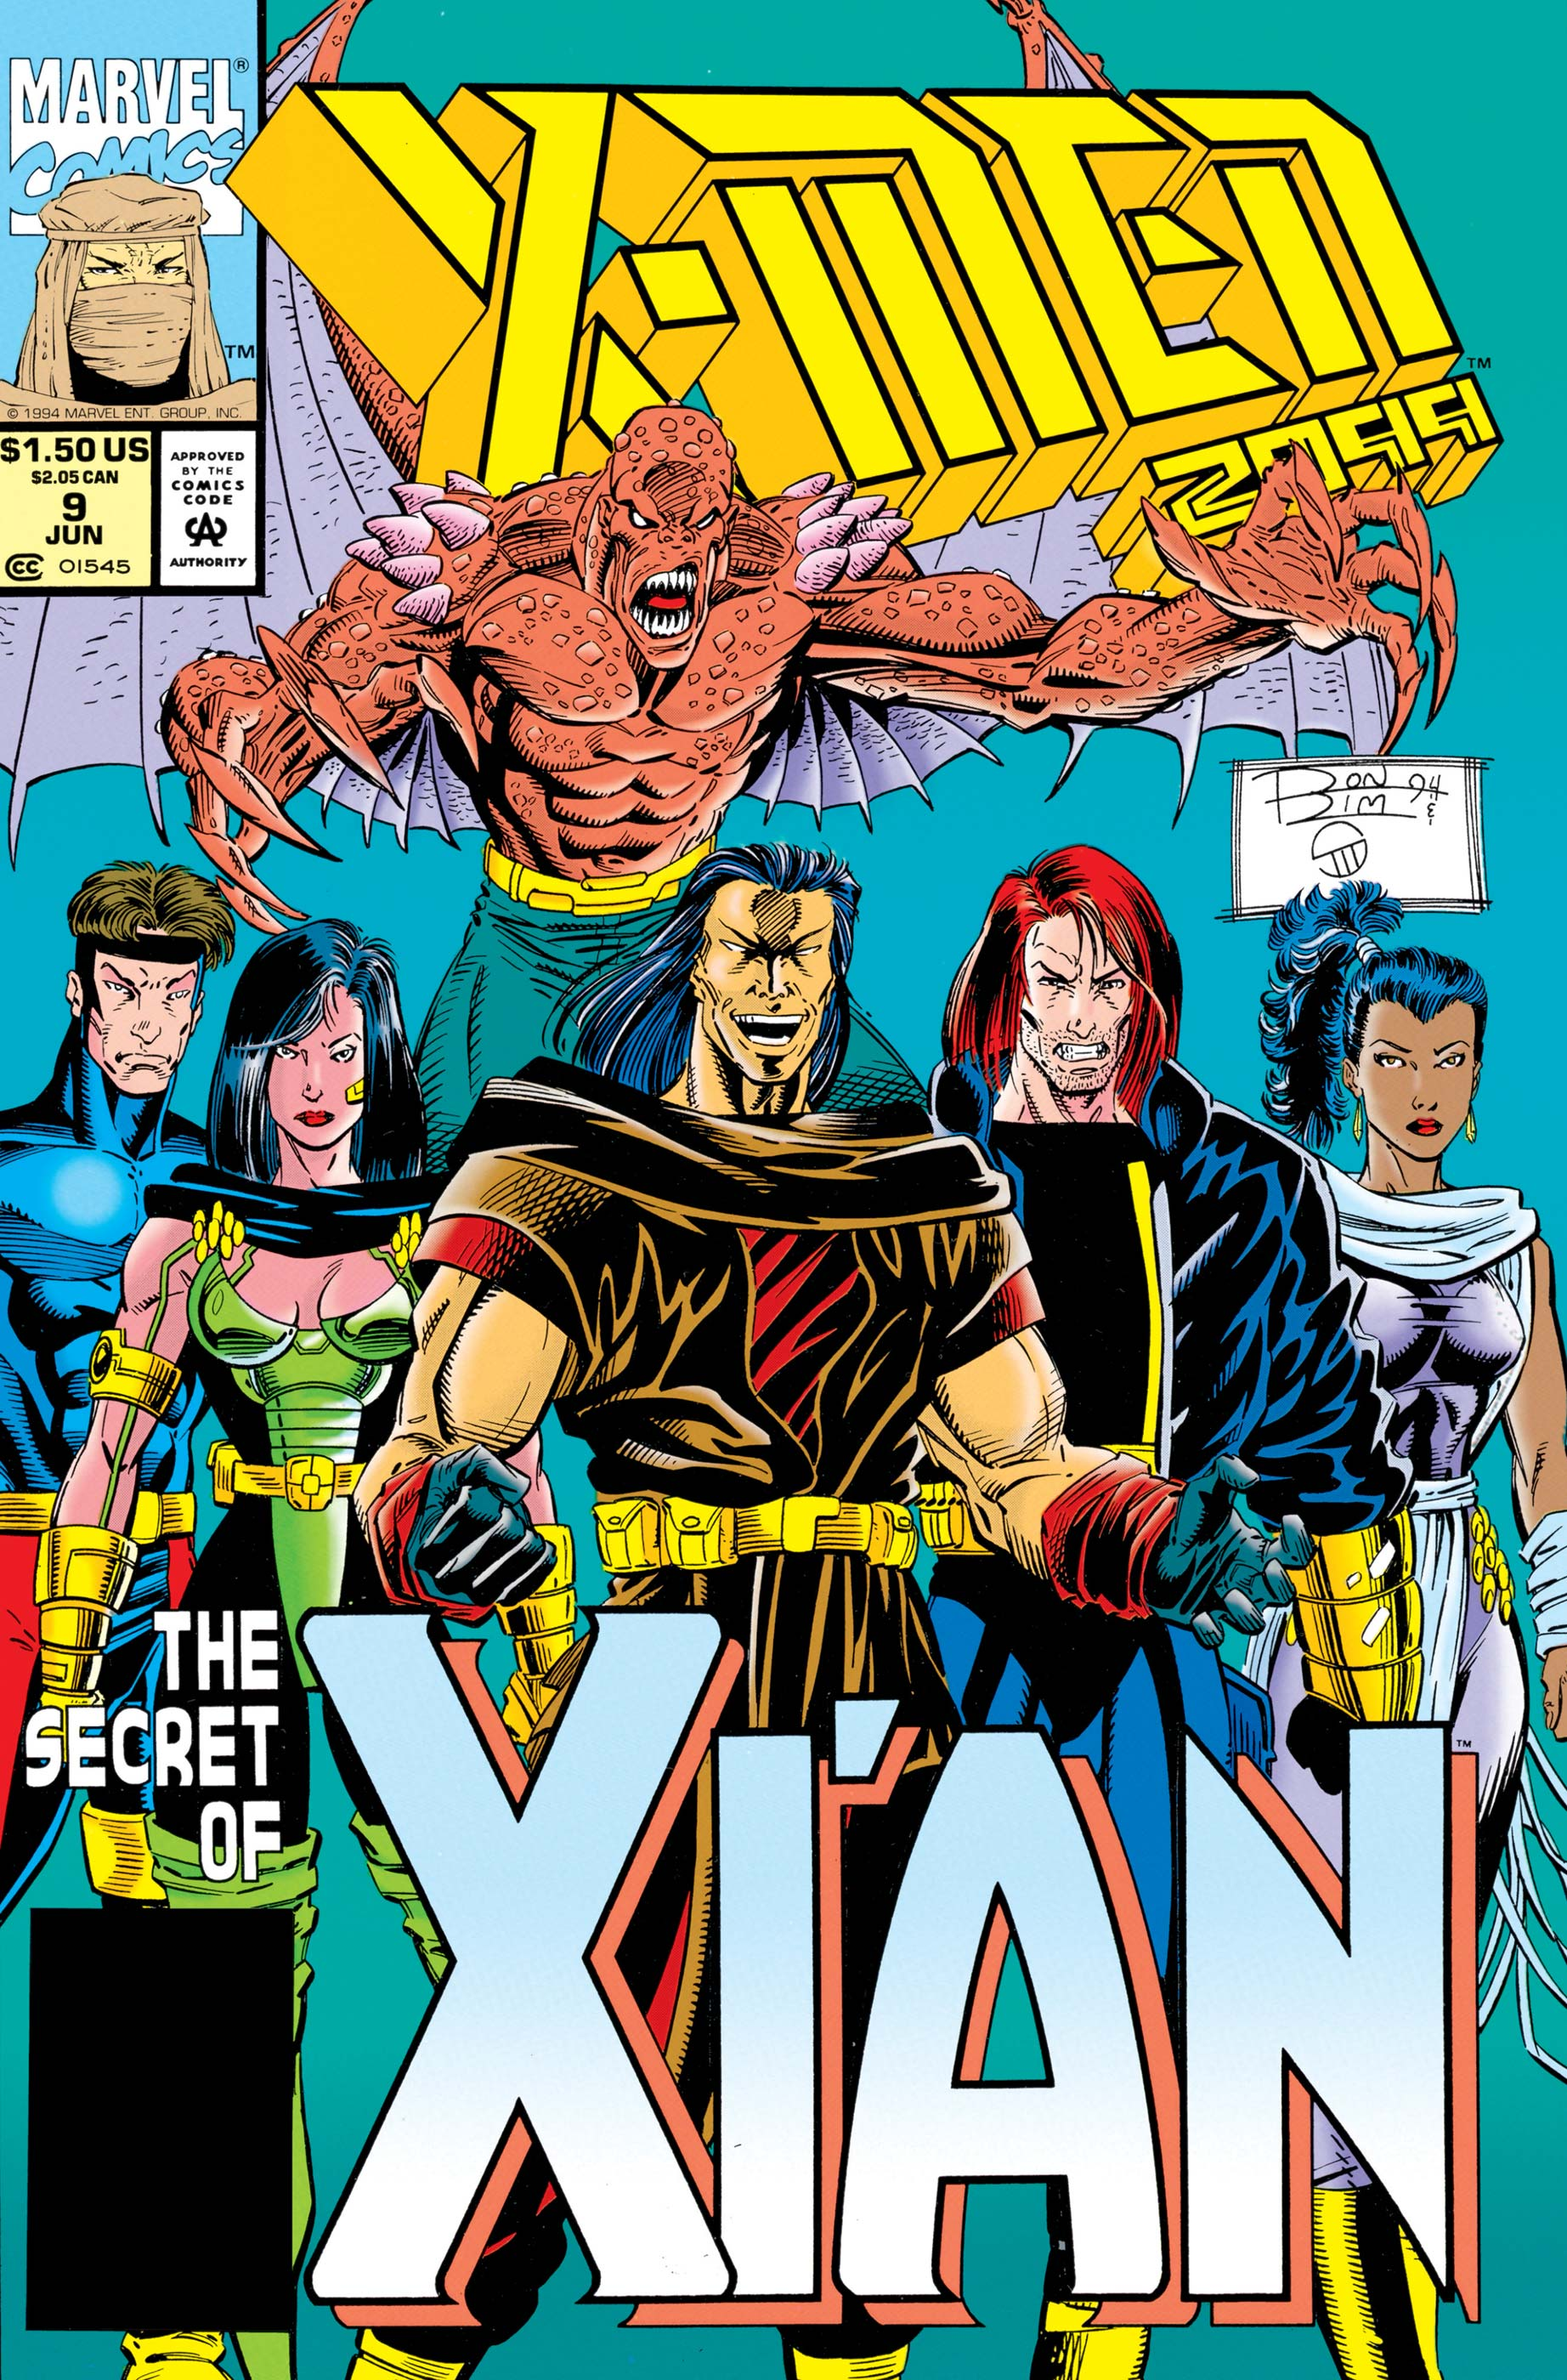 X-Men 2099 (1993) #9